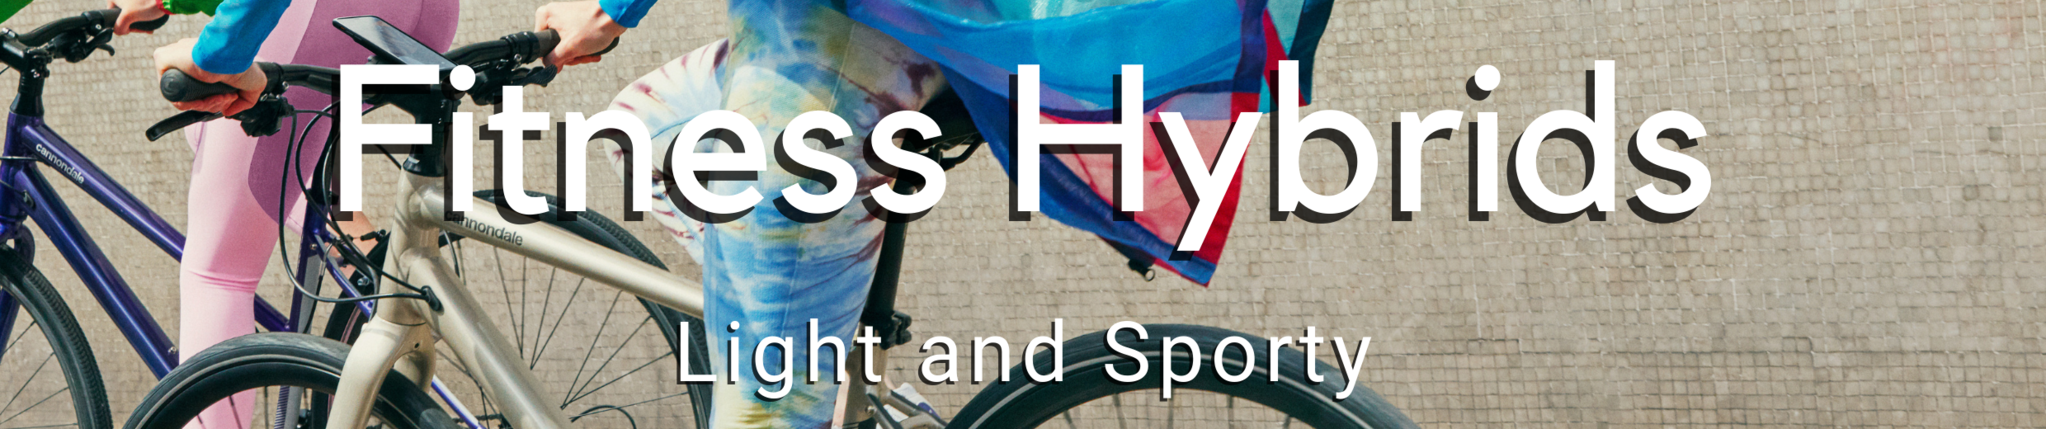 Fitness Hybrid